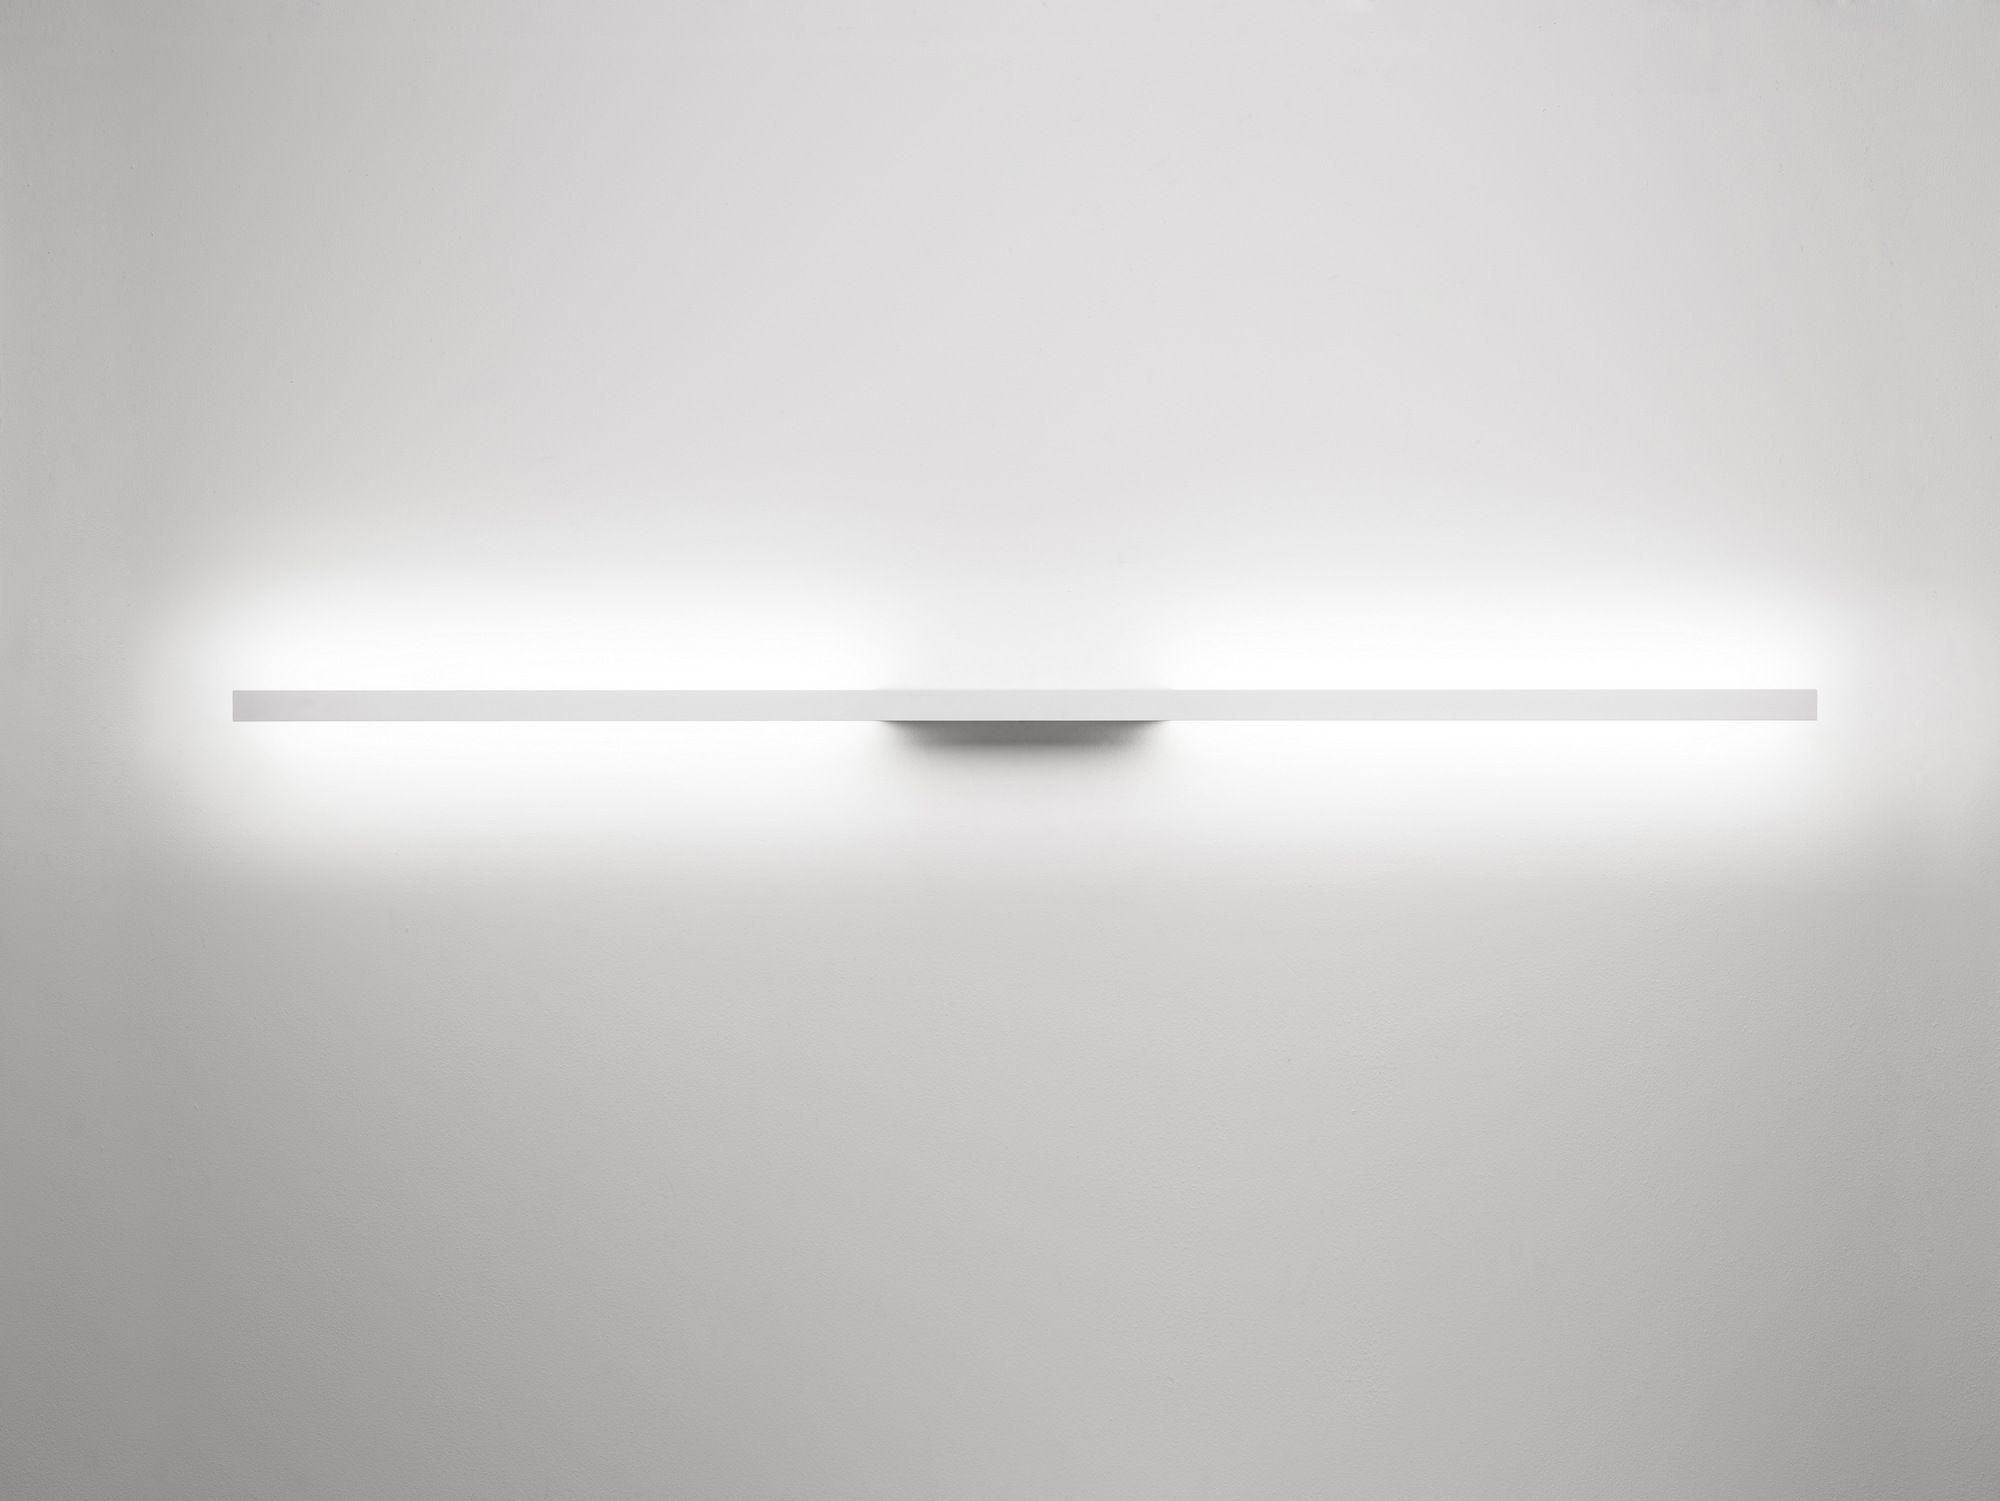 Xilema Led Wall Light By Linea Light Group Design Edin Dedovic Lampara De Pared Iluminacion